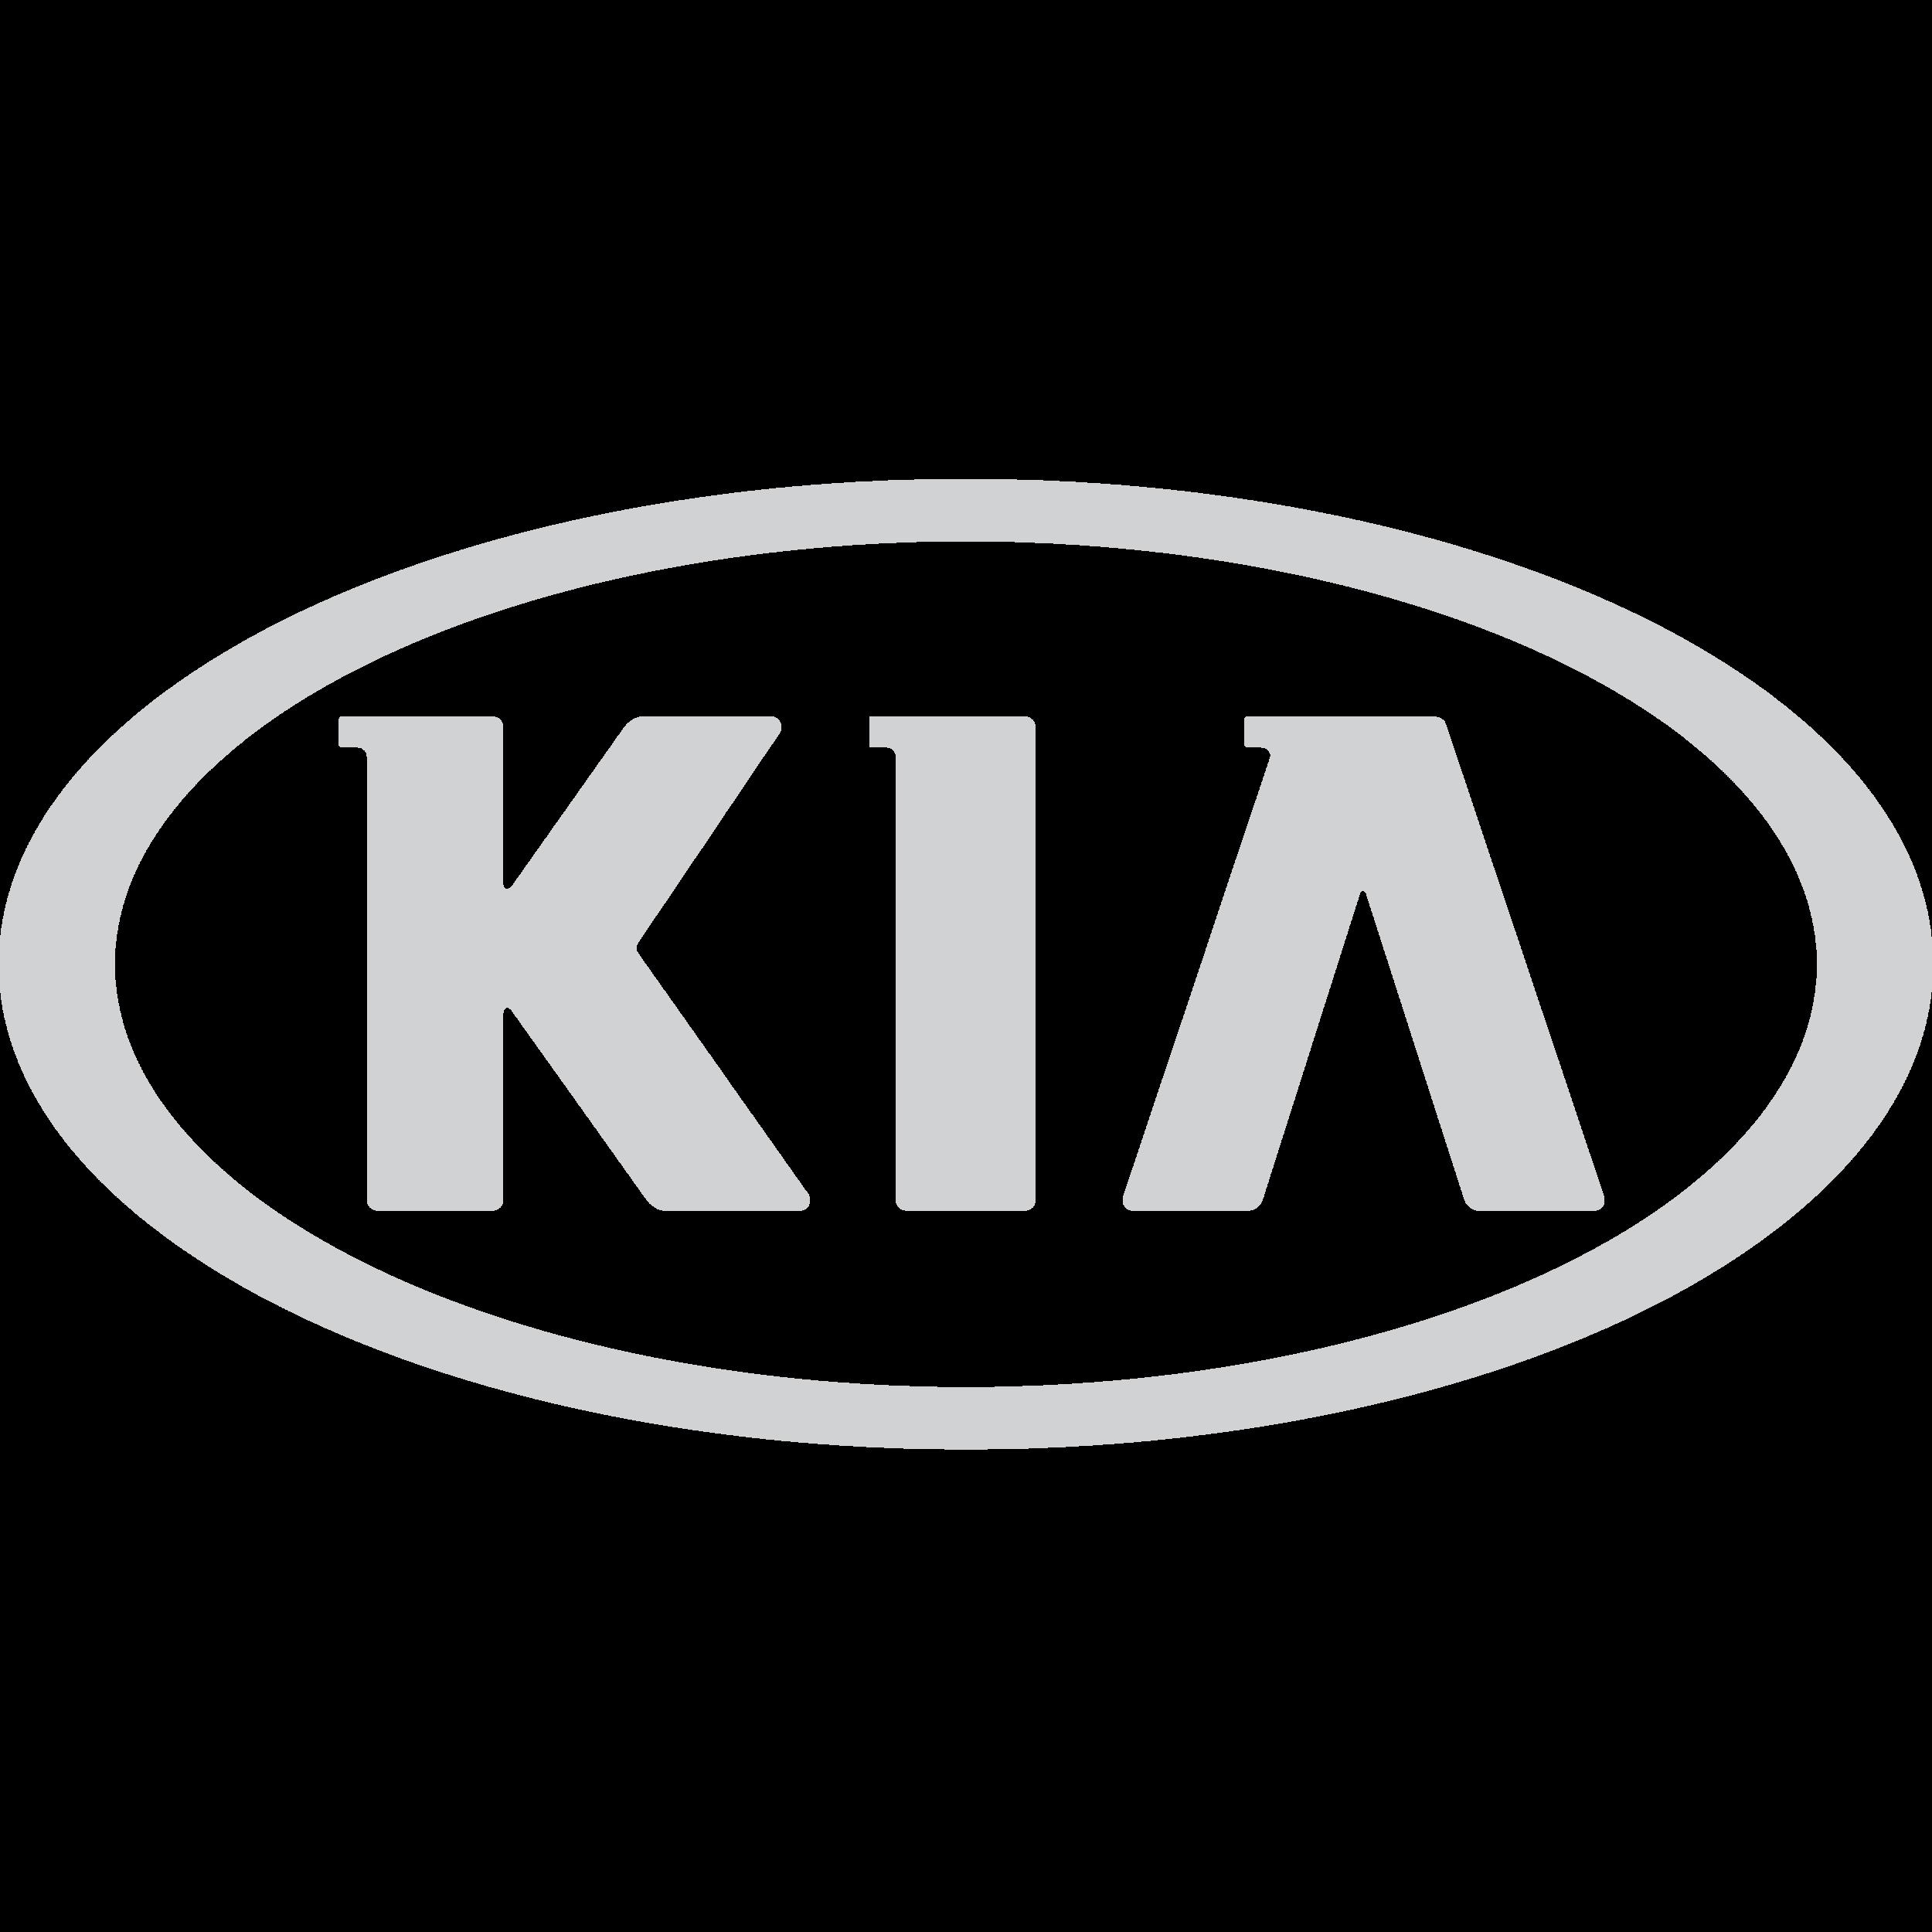 Kia-01.png